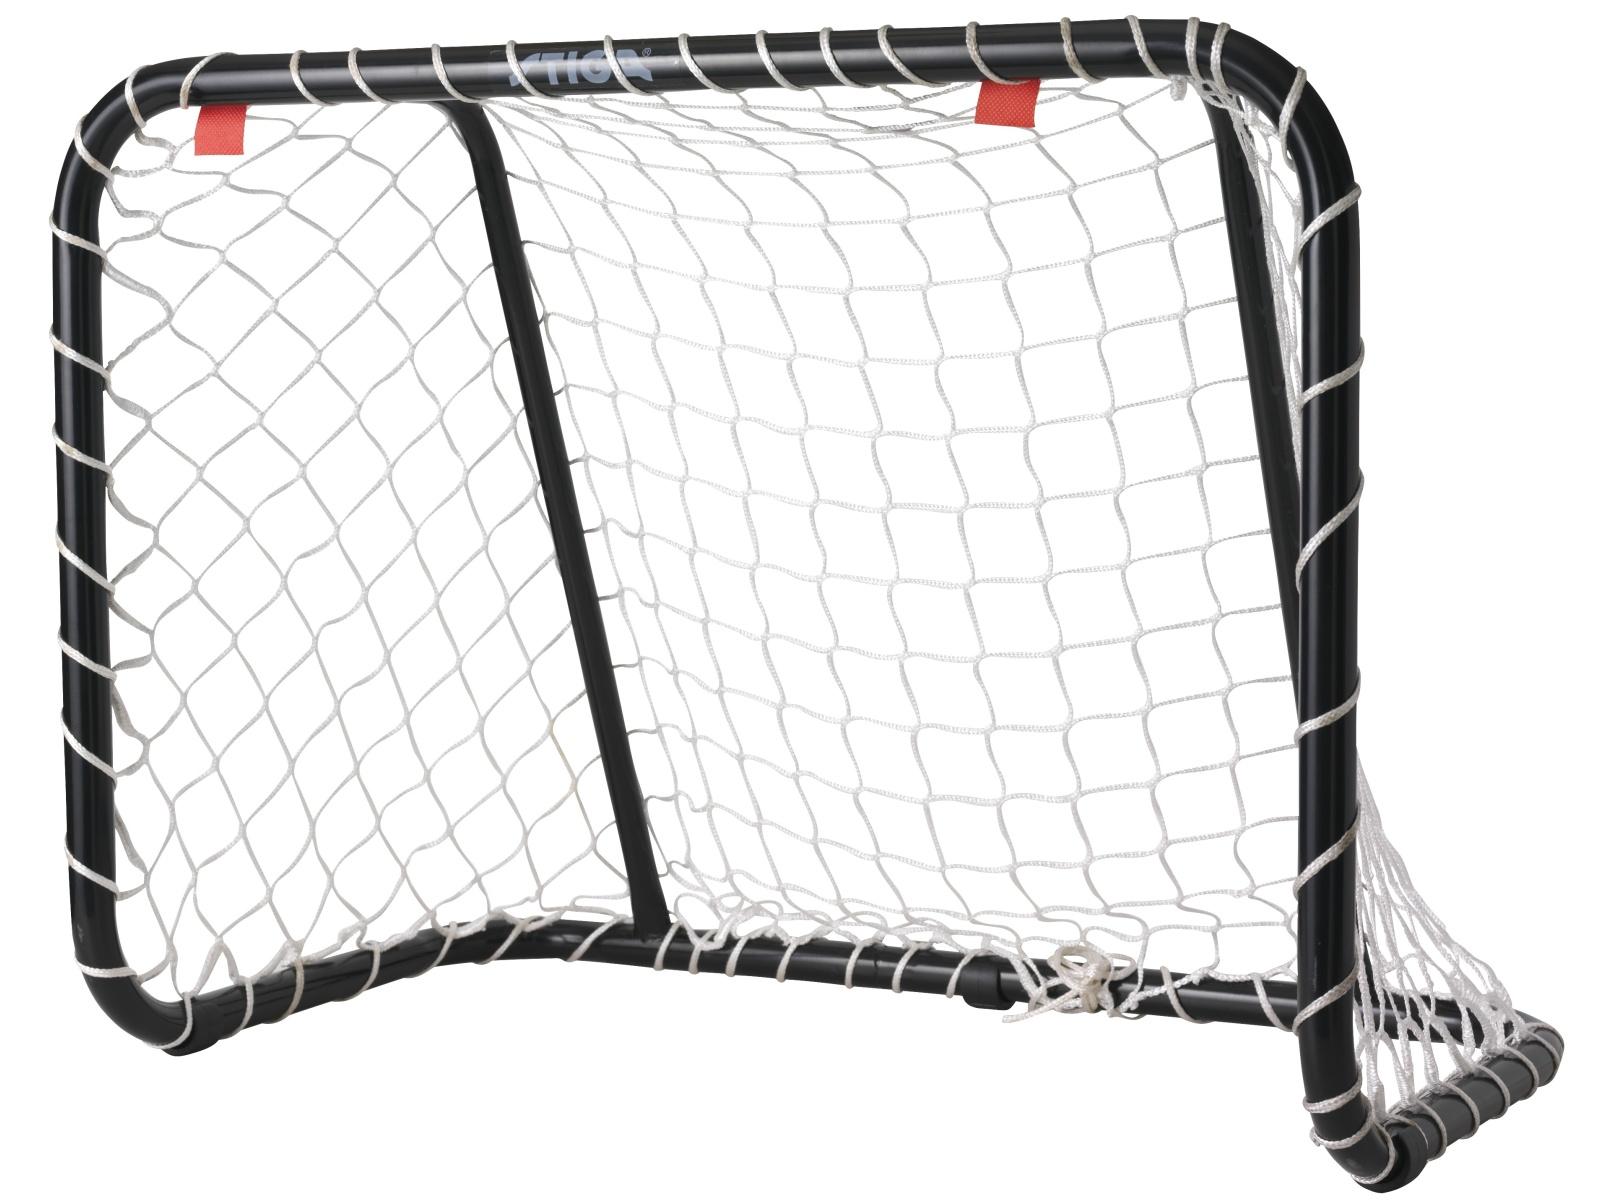 Branka STIGA Goal Mini 62 x 46 cm